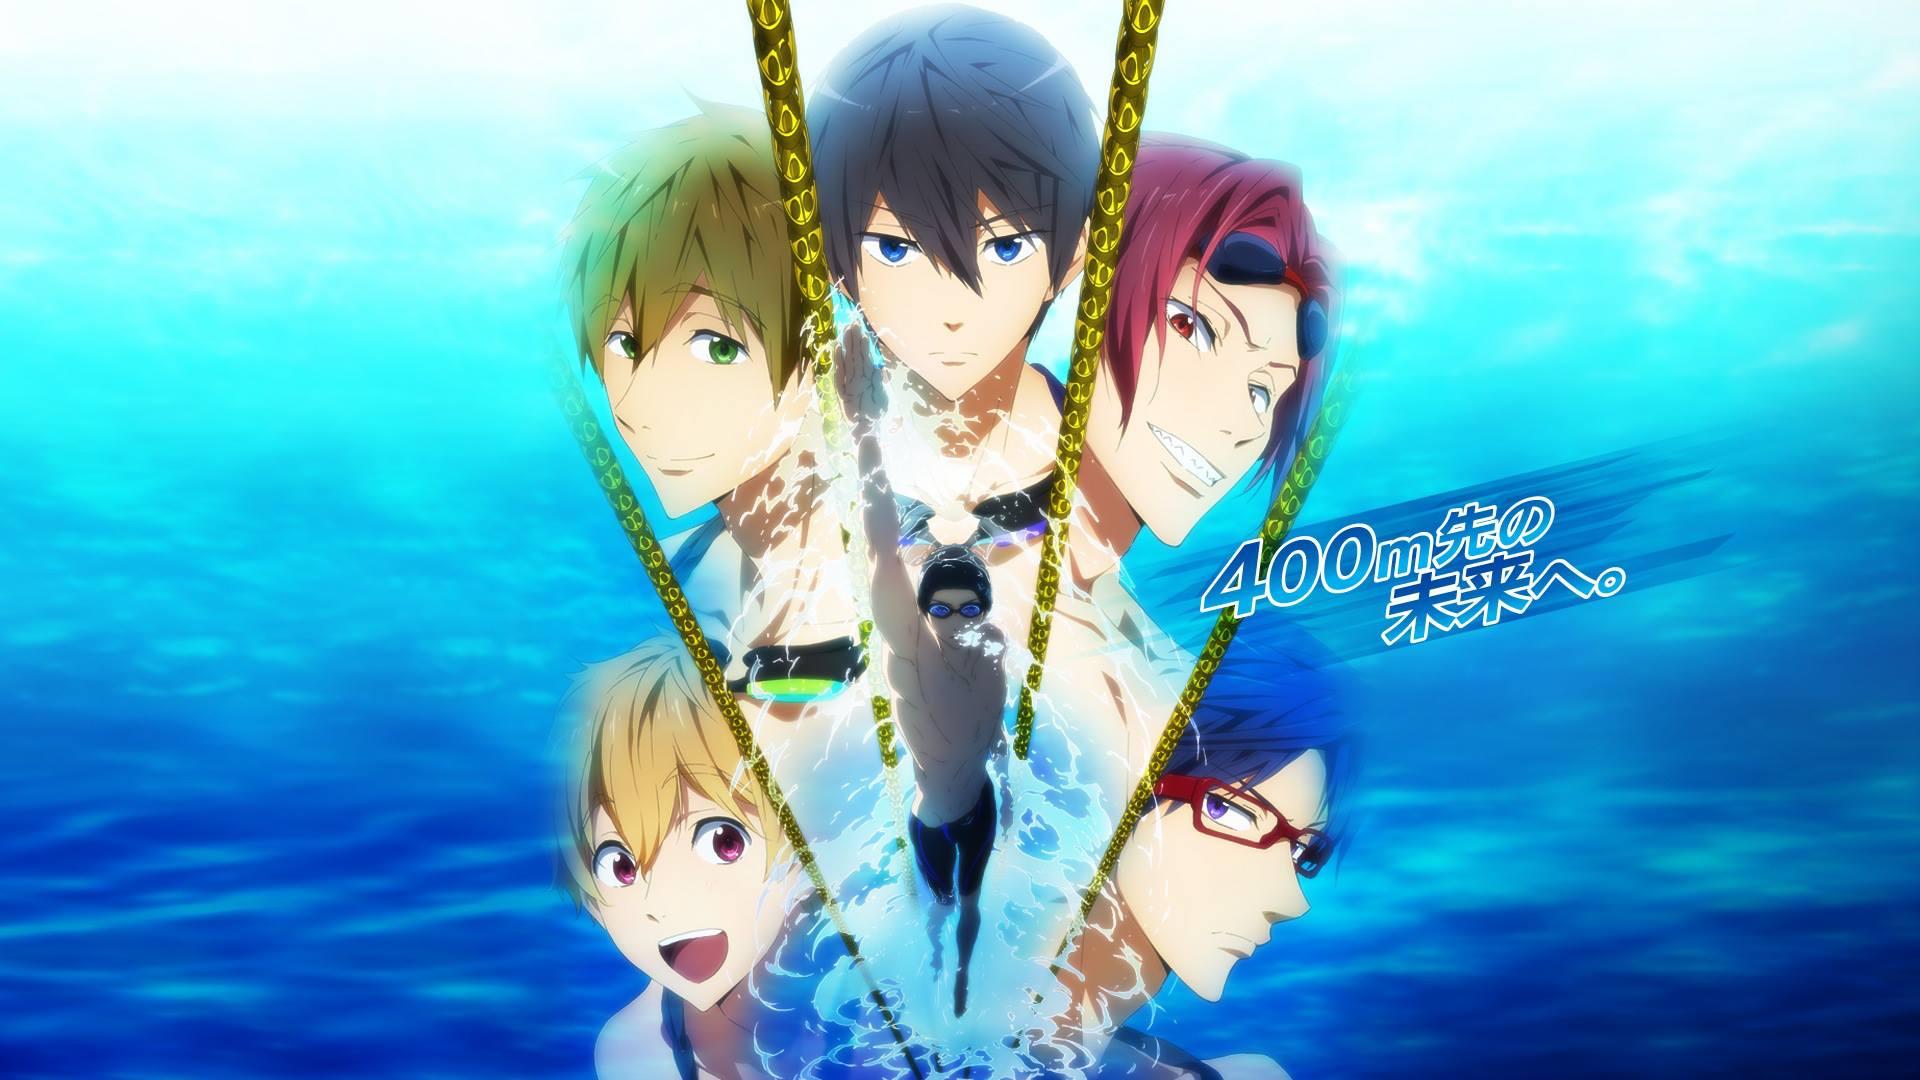 Free hd wallpaper zerochan anime image board free download free image voltagebd Images